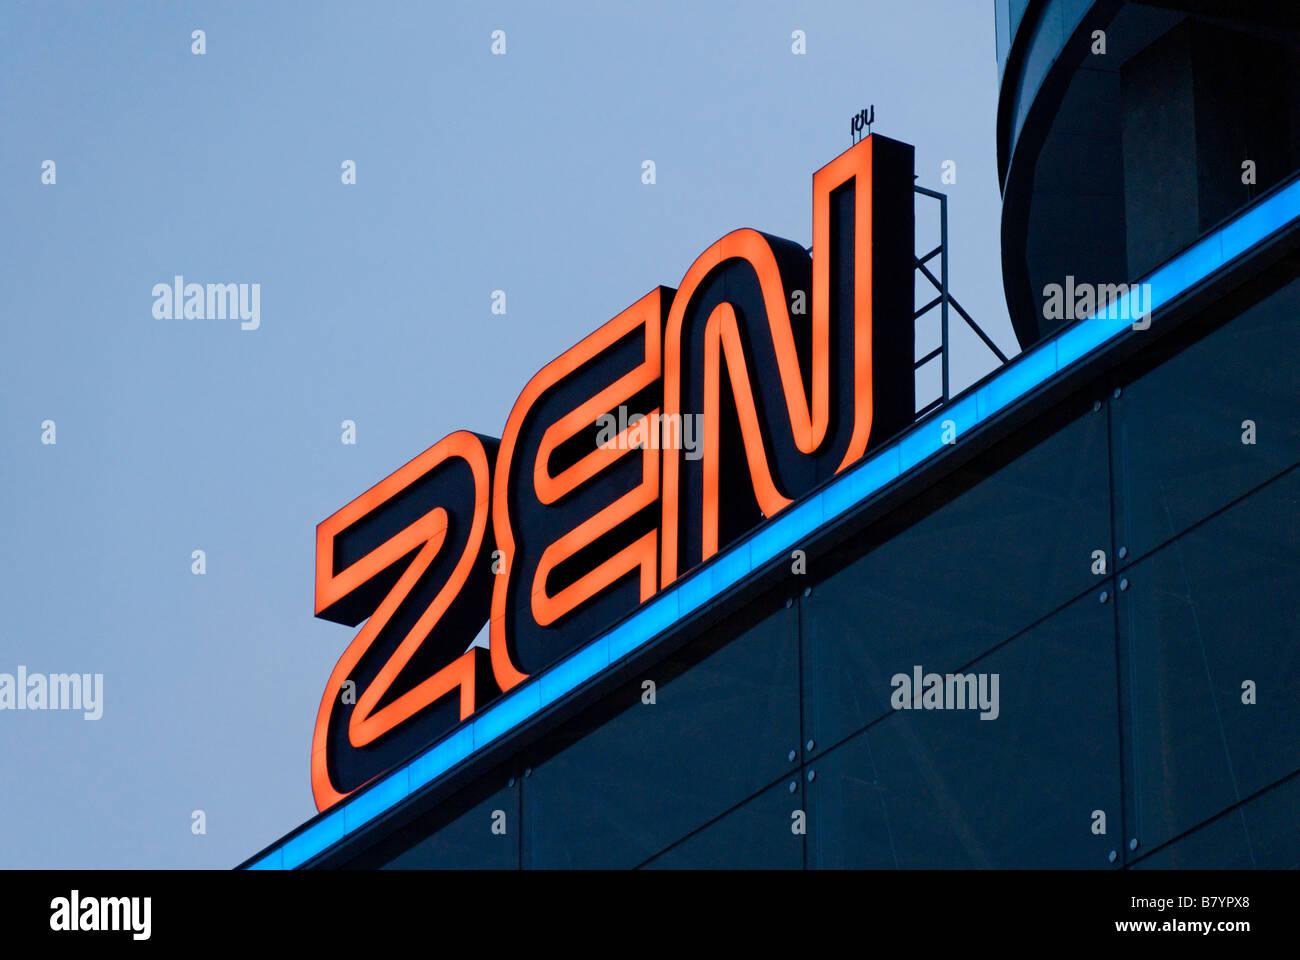 Zen upmarket shopping mall sign Pathumwan district in central Bangkok Thailand - Stock Image